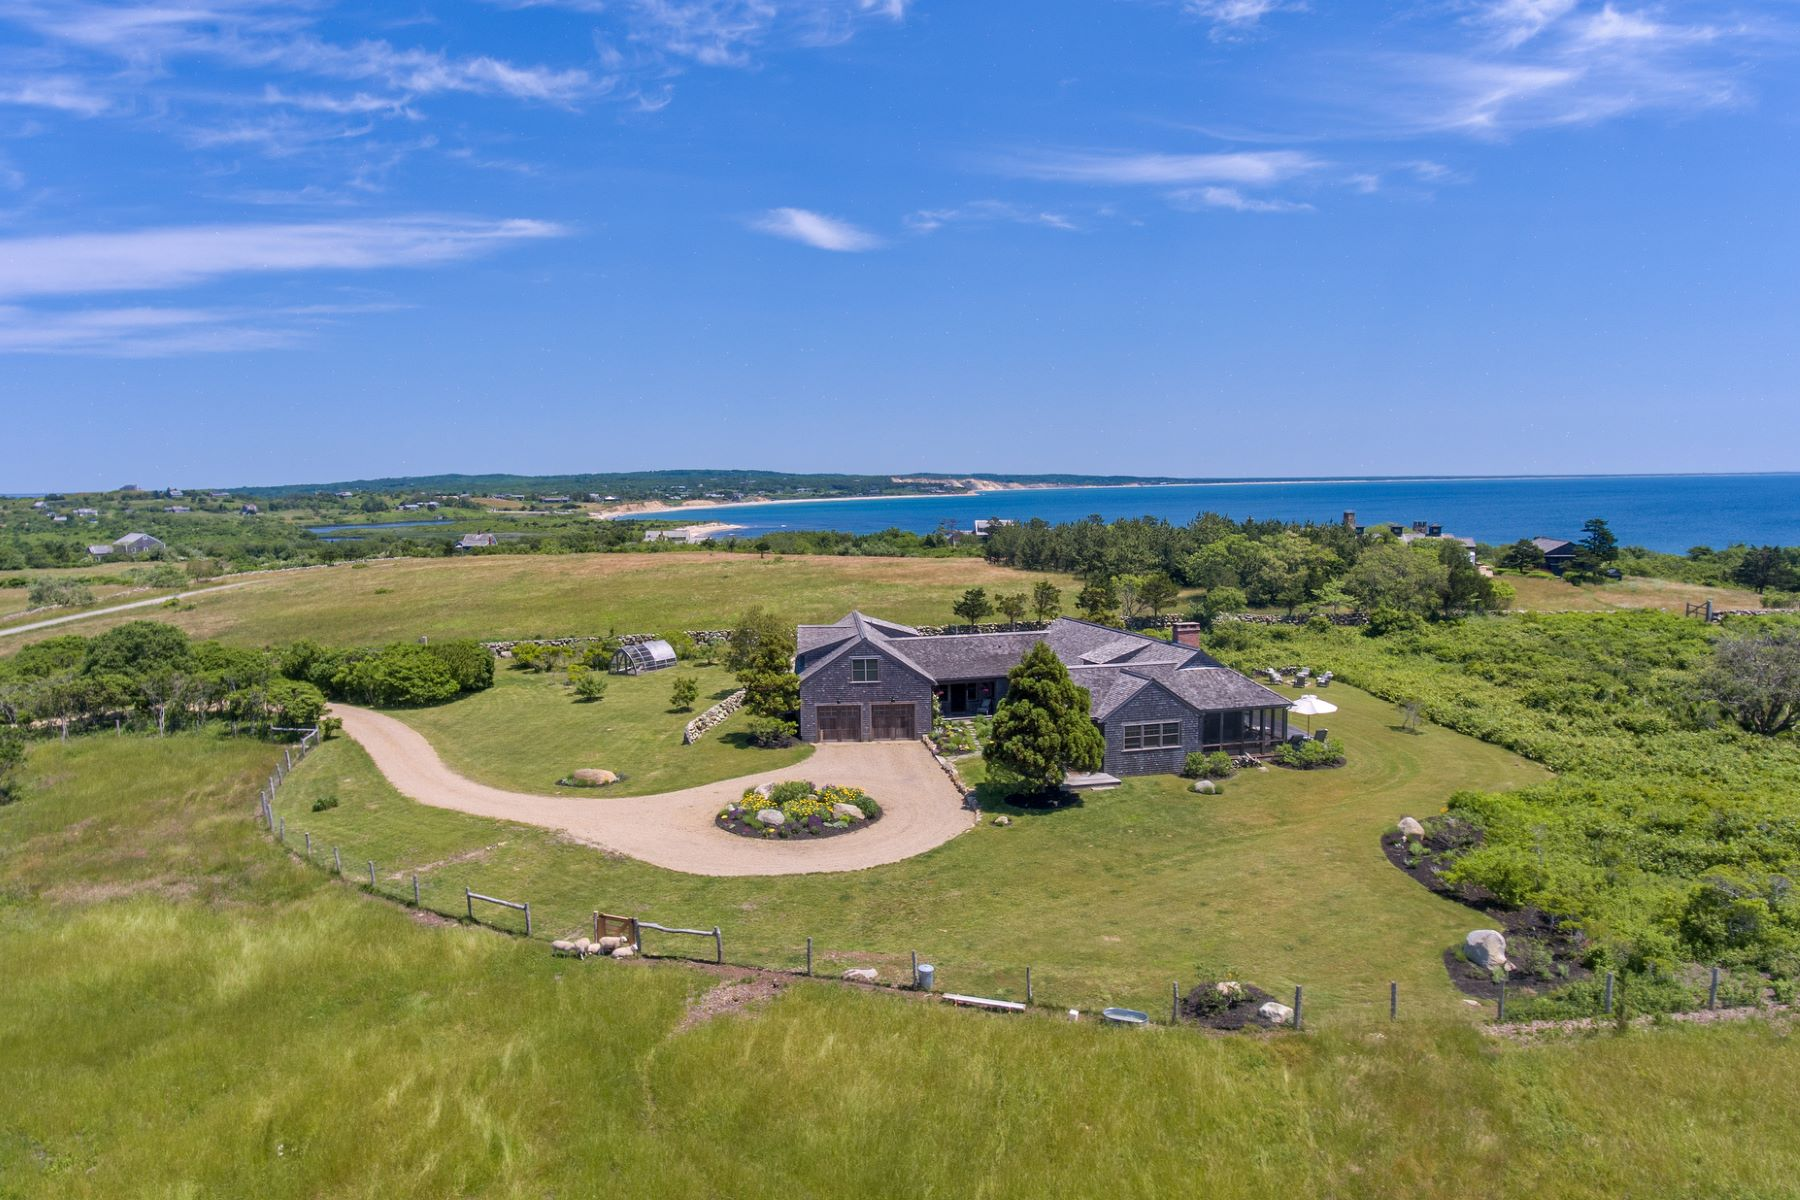 Single Family Homes για την Πώληση στο Exclusive Squibnocket Farm Waterview Estate 18 Spruce Gate Road, Chilmark, Μασαχουσετη 02535 Ηνωμένες Πολιτείες